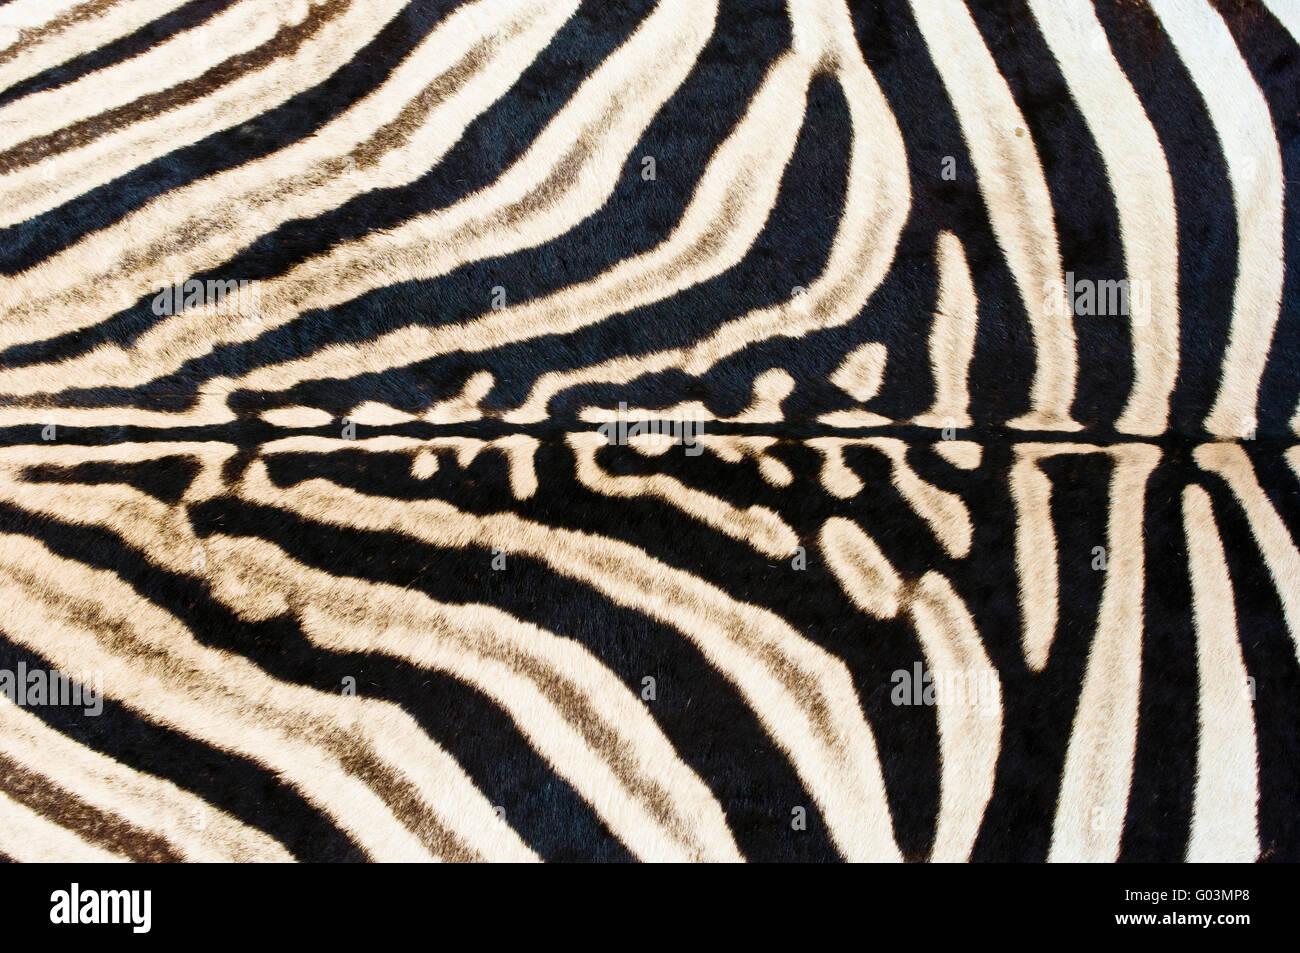 Detail image of a zebra skin floor rug - Stock Image